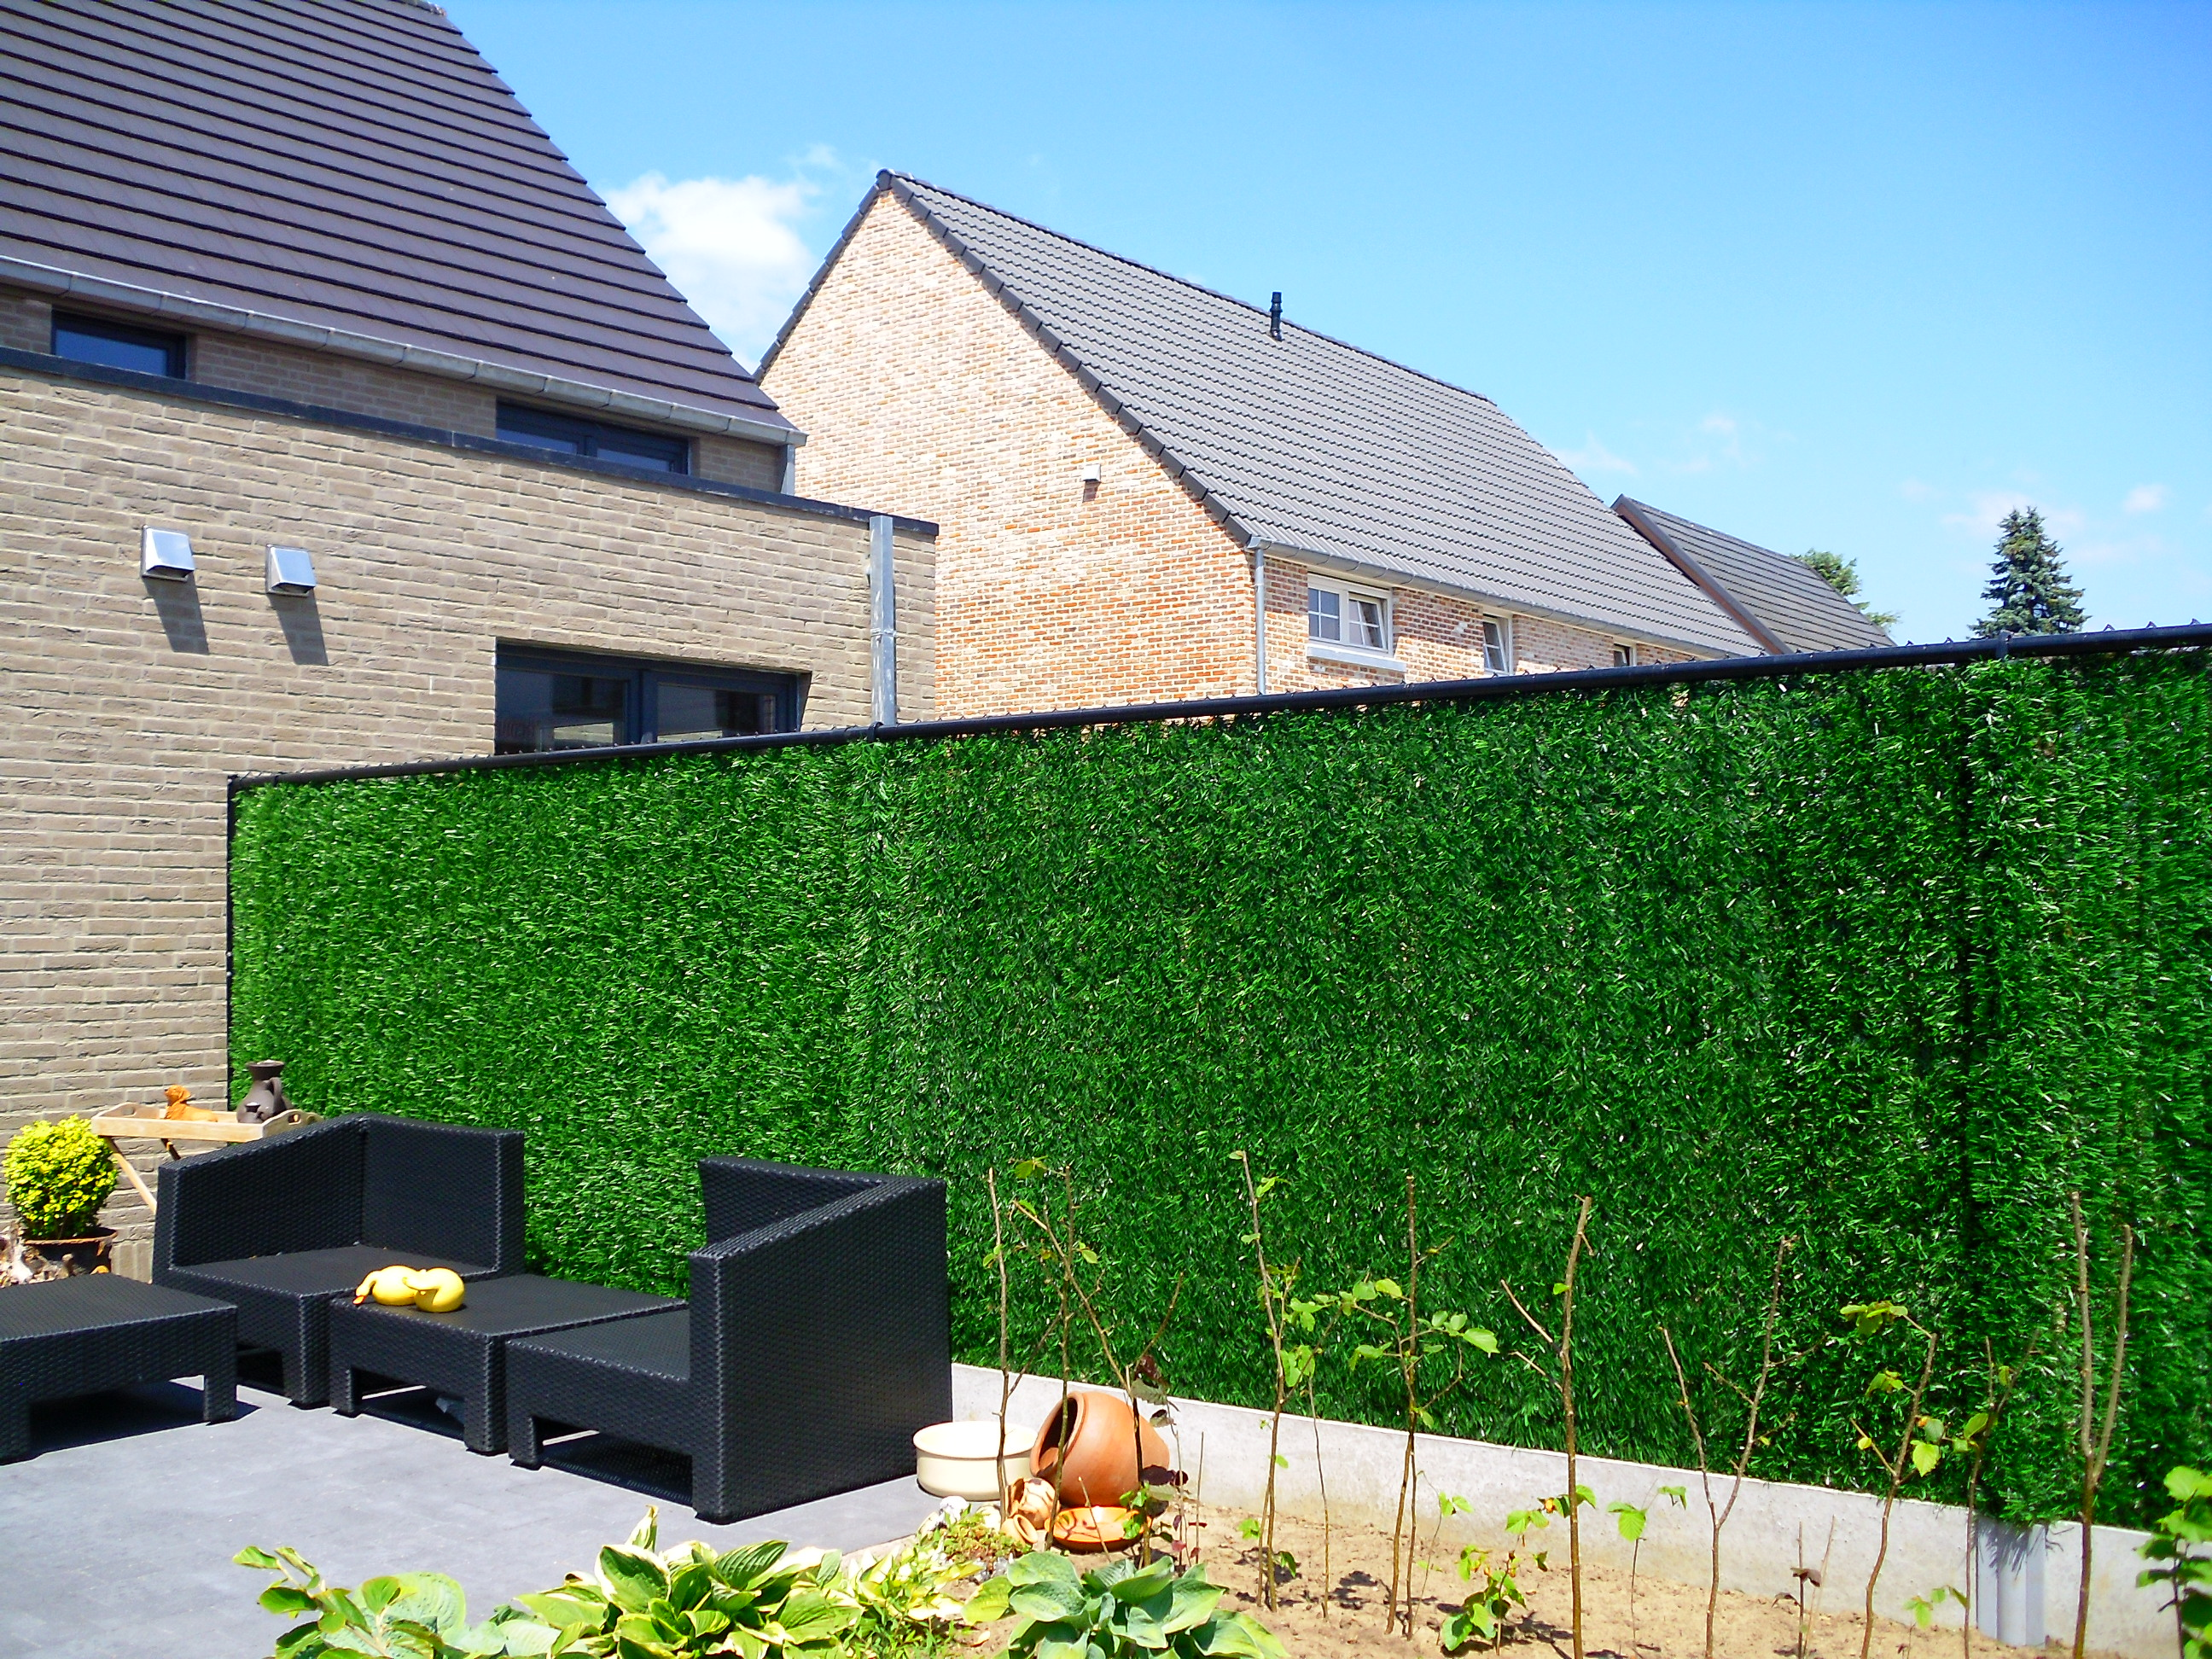 Goedkope Omheining Tuin : Mooie goedkope kunsthagen safegarden green korting vanaf u ac